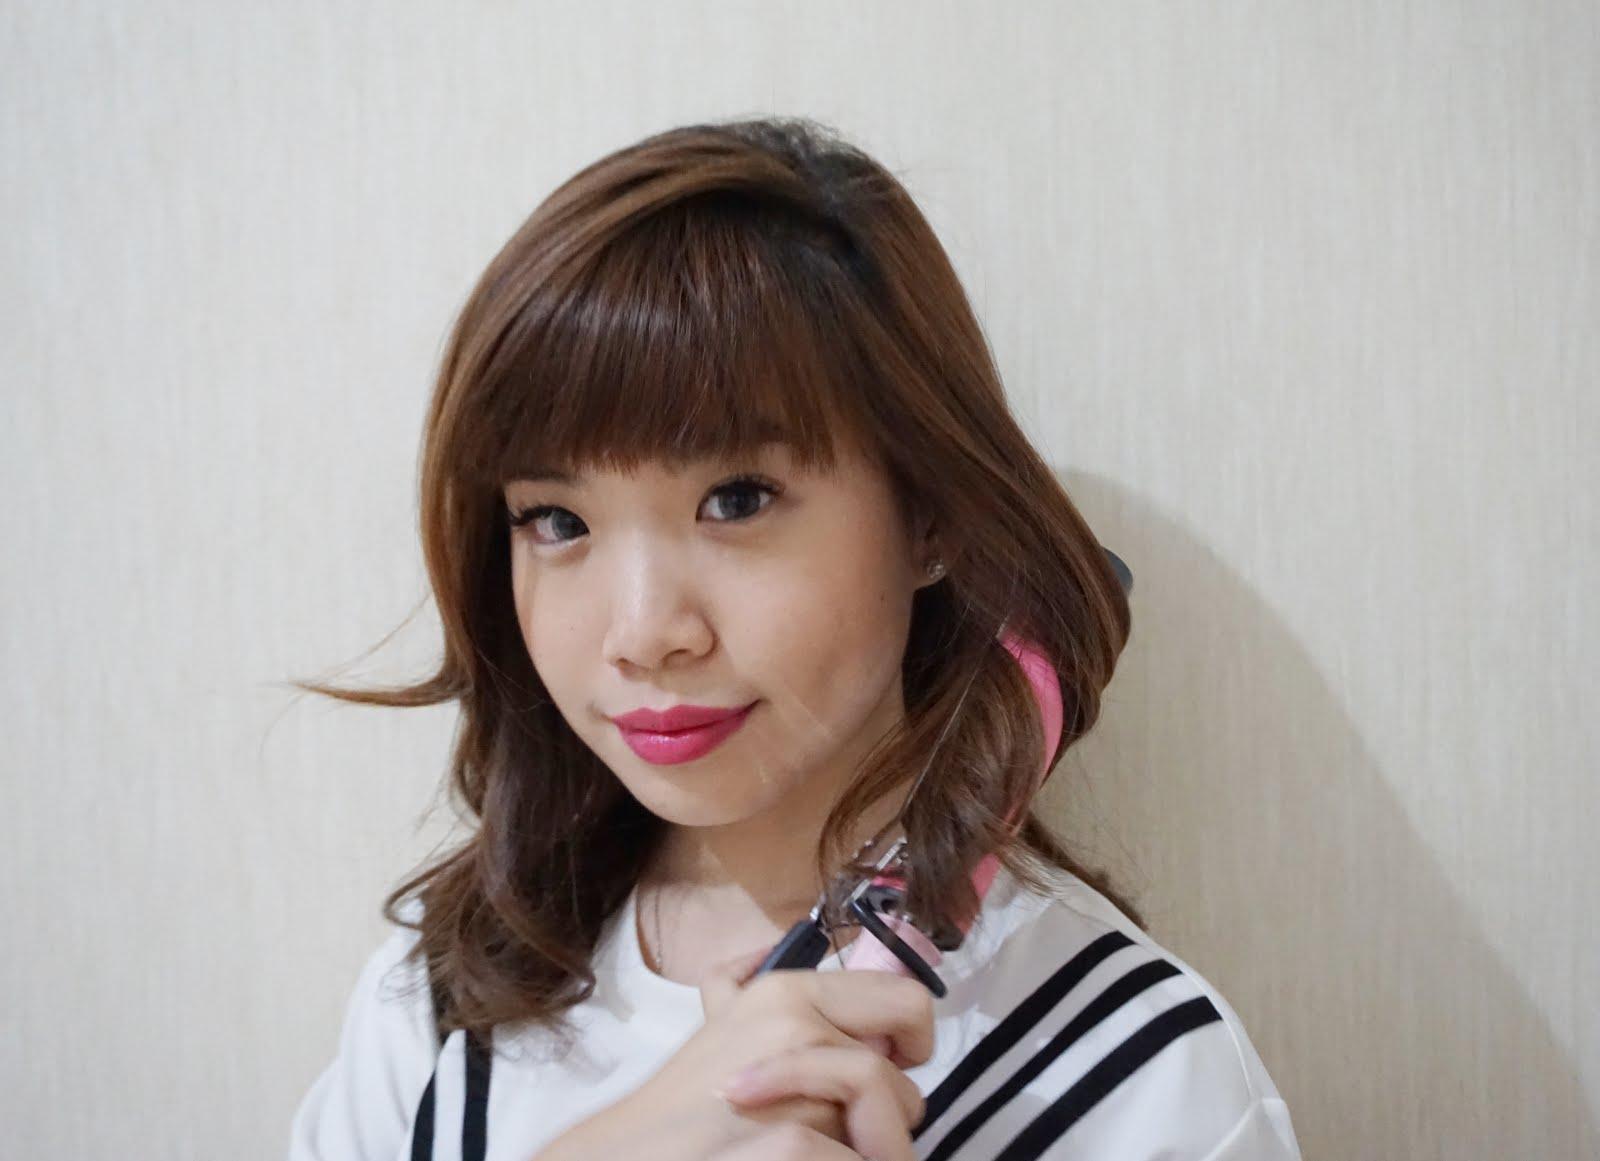 [Review]: Charis X Hair Diva Combo by Vodana - Stevie Wong